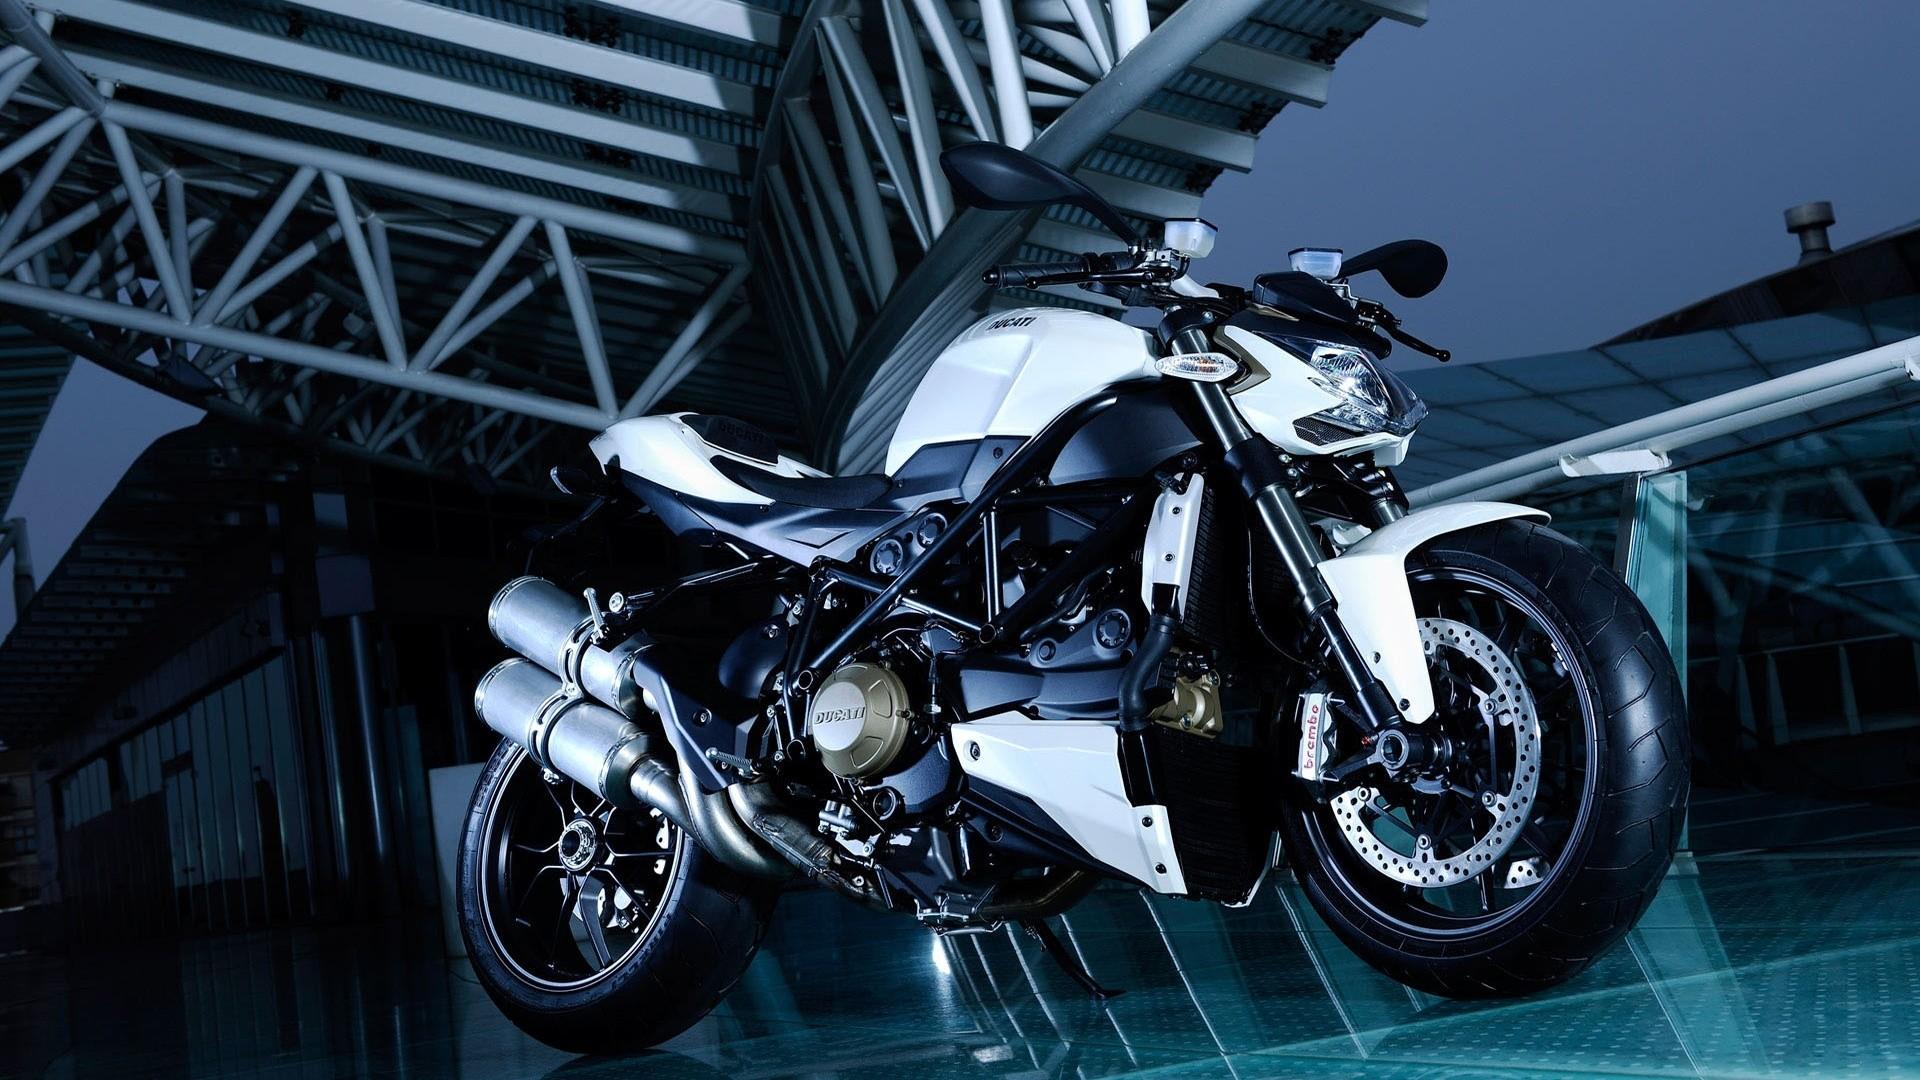 … Ducati Hd Wallpaper